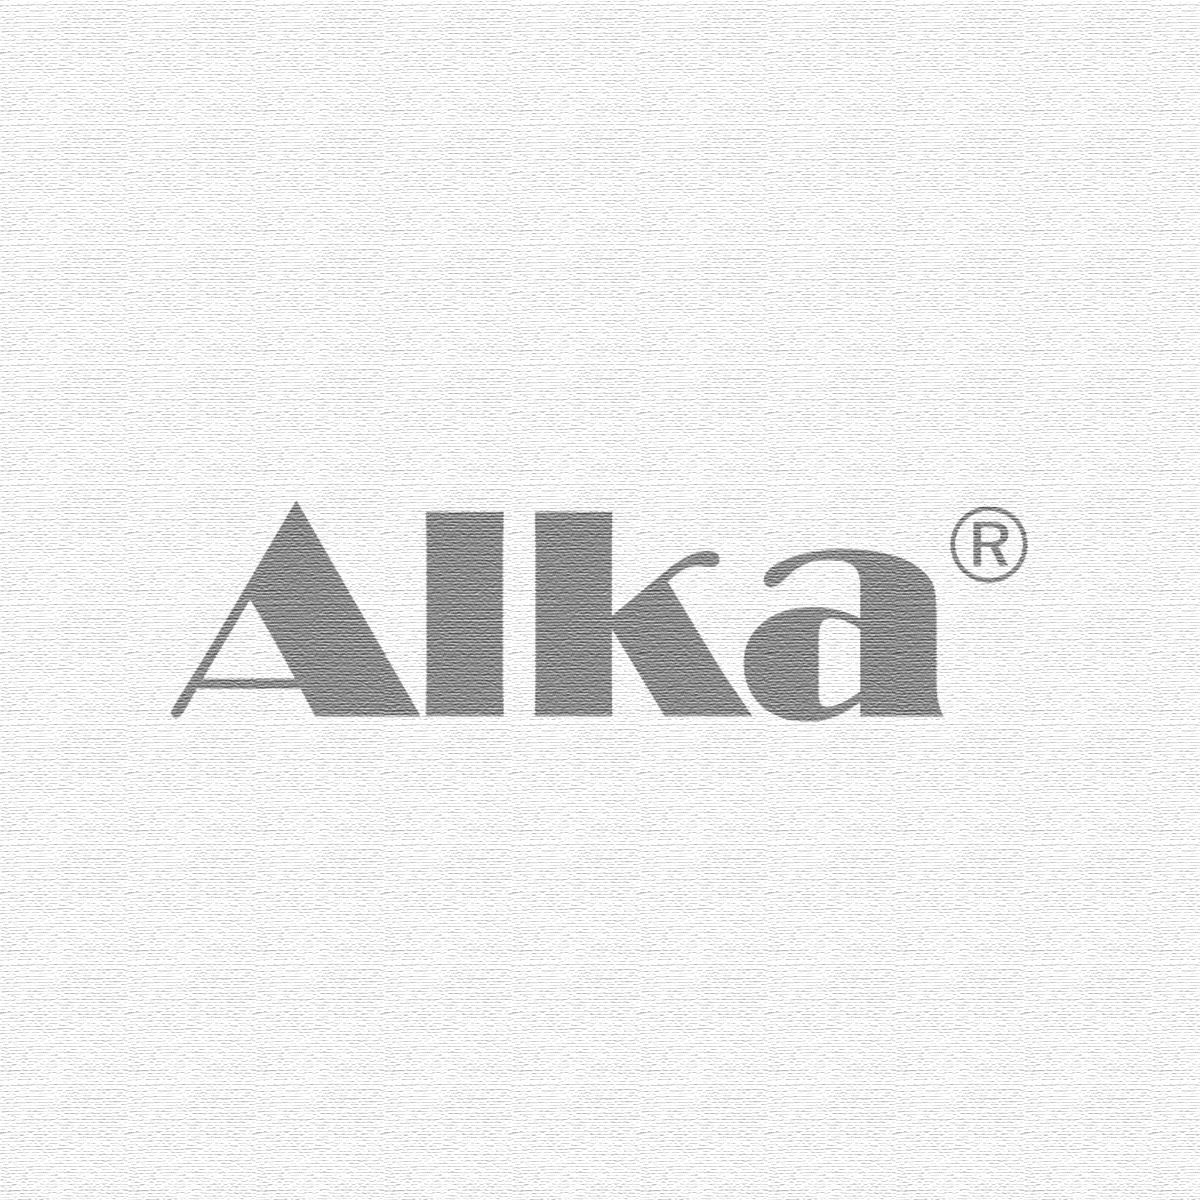 Alka® Drops - 37ml - Dutch label